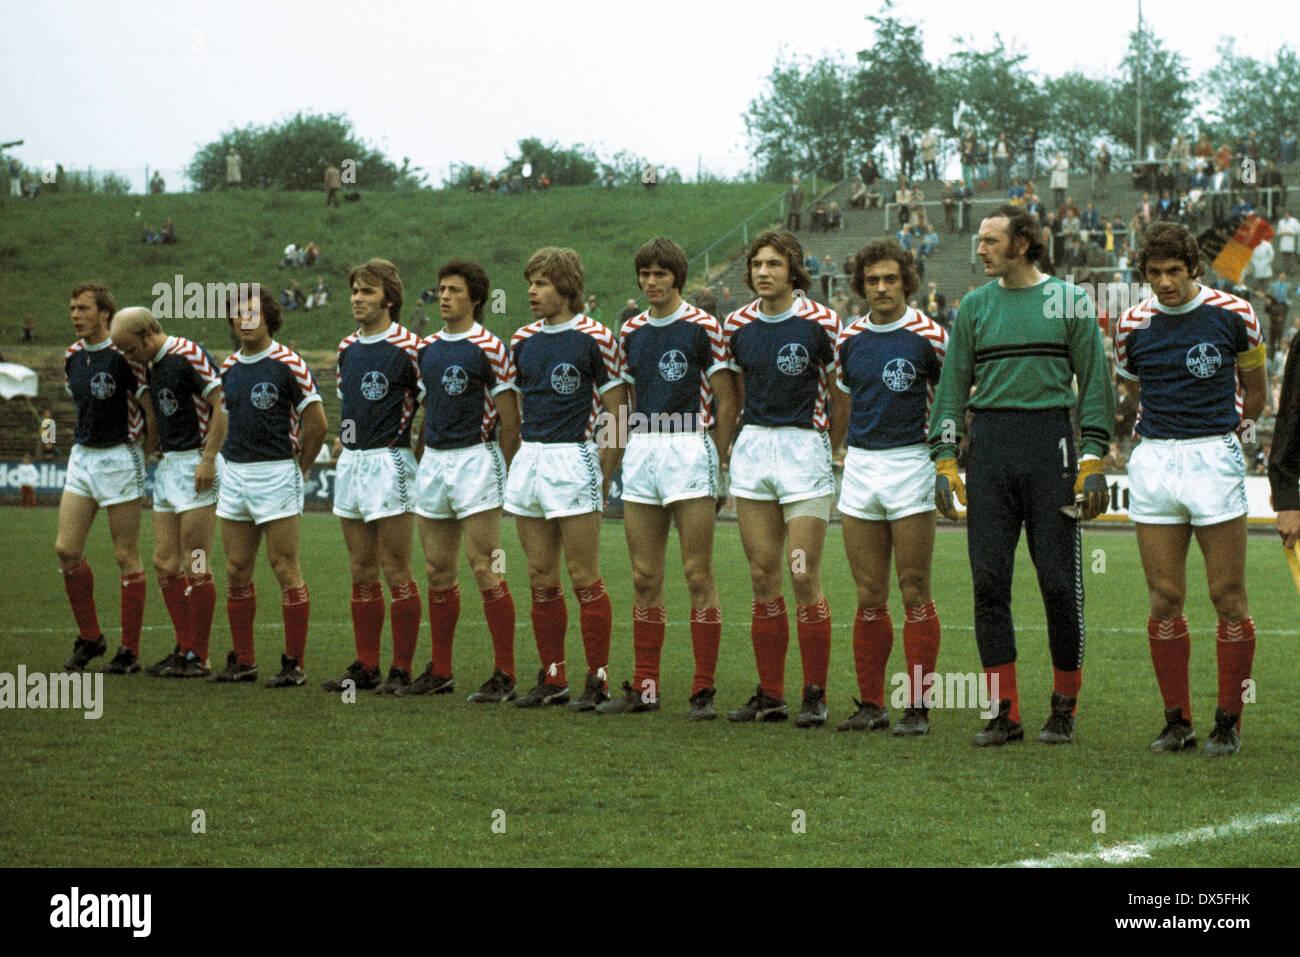 football, 2. Bundesliga Nord, 1974/1975, Stadium am Uhlenkrug, ETB Schwarz Weiss Essen versus FC Bayer 05 Uerdingen 1:2, team shot Uerdingen, f.l.t.r. Horst Riege, Lothar Prehn, Hans-Juergen Wloka, Edmund Stieber, Franz Raschid, Norbert Brinkmann, Friedhe - Stock Image